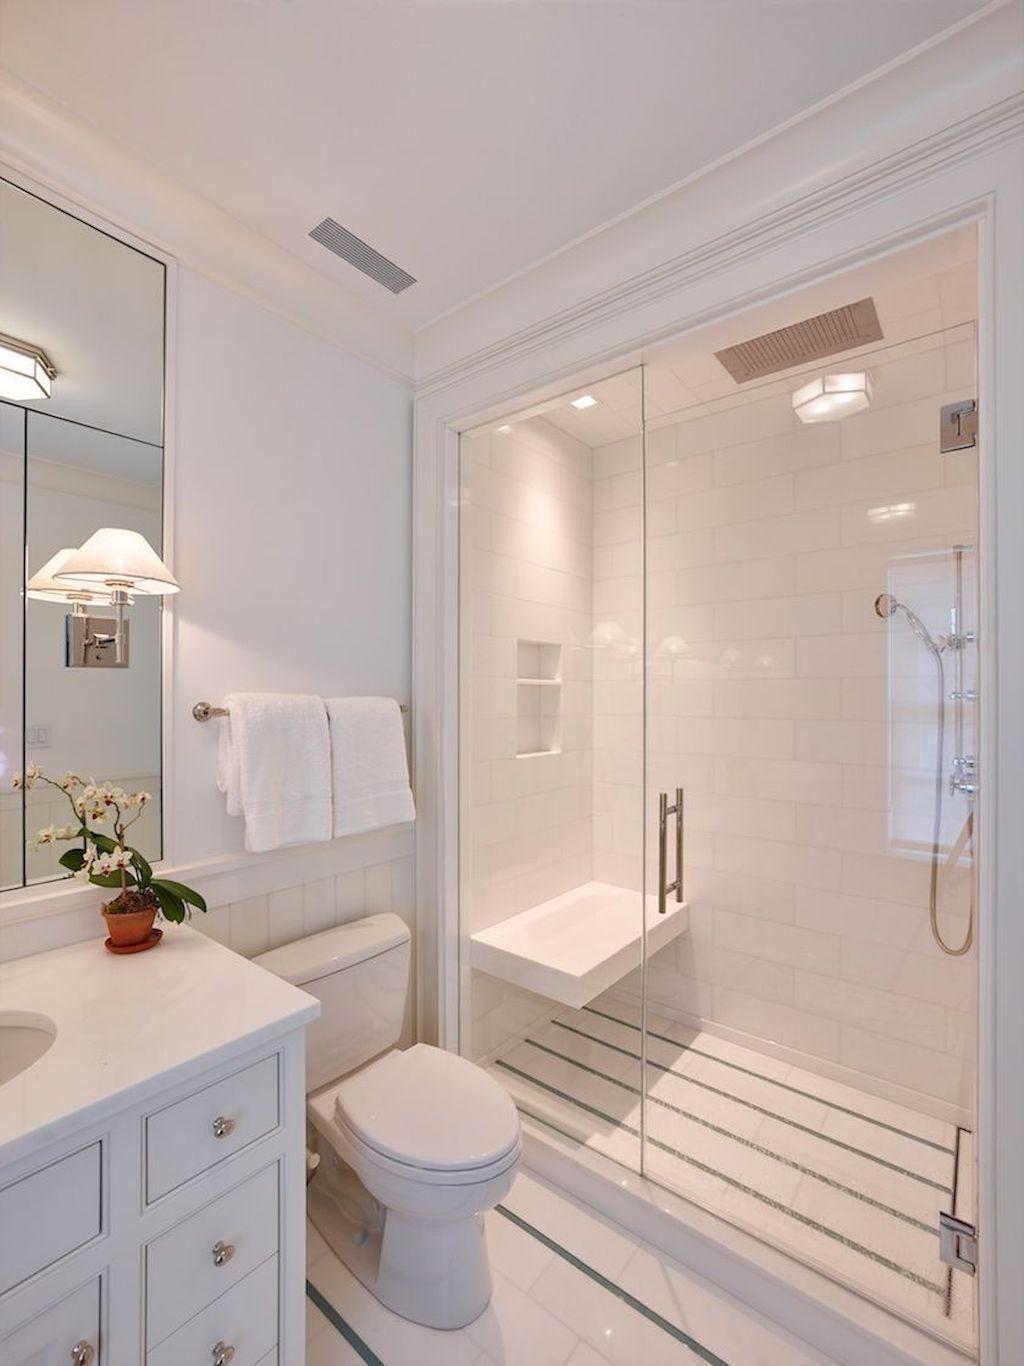 6 Wonderful Cool Tricks Bathroom Remodel Cabinets Glass Doors